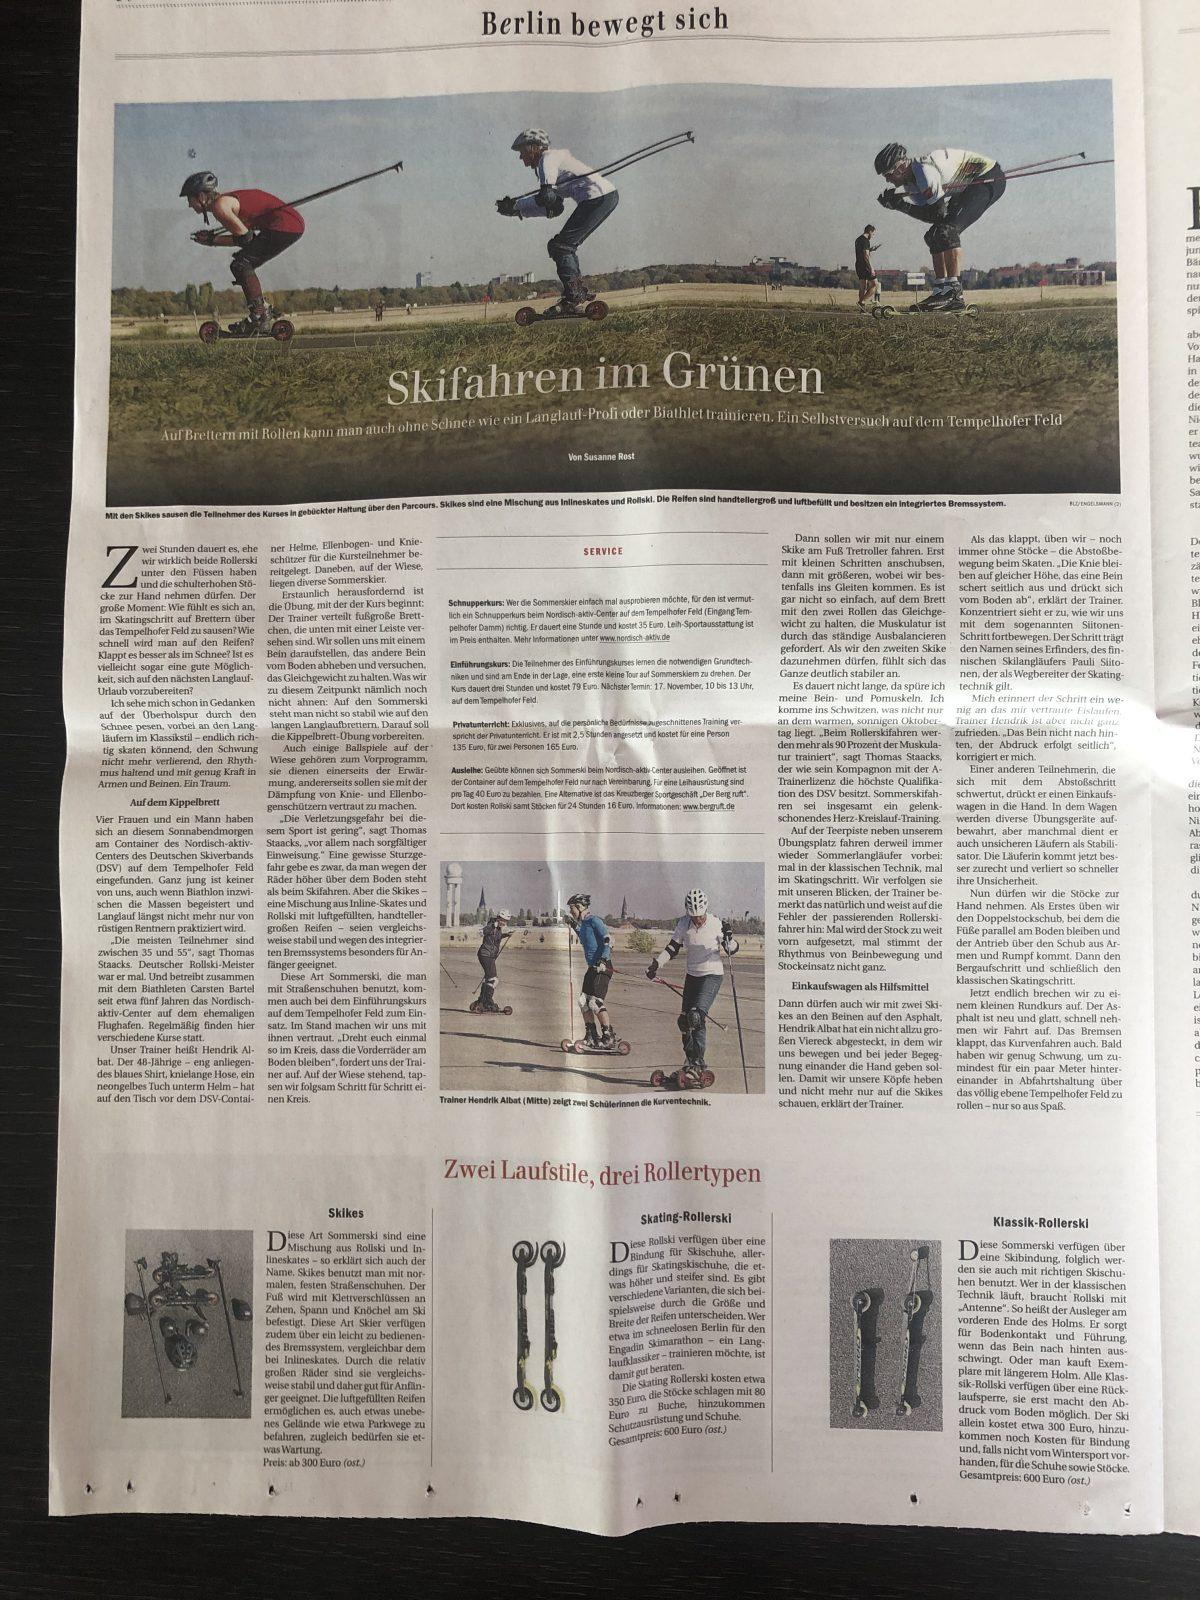 nordisch aktiv Berliner Zeitung Skiroller Cross skating